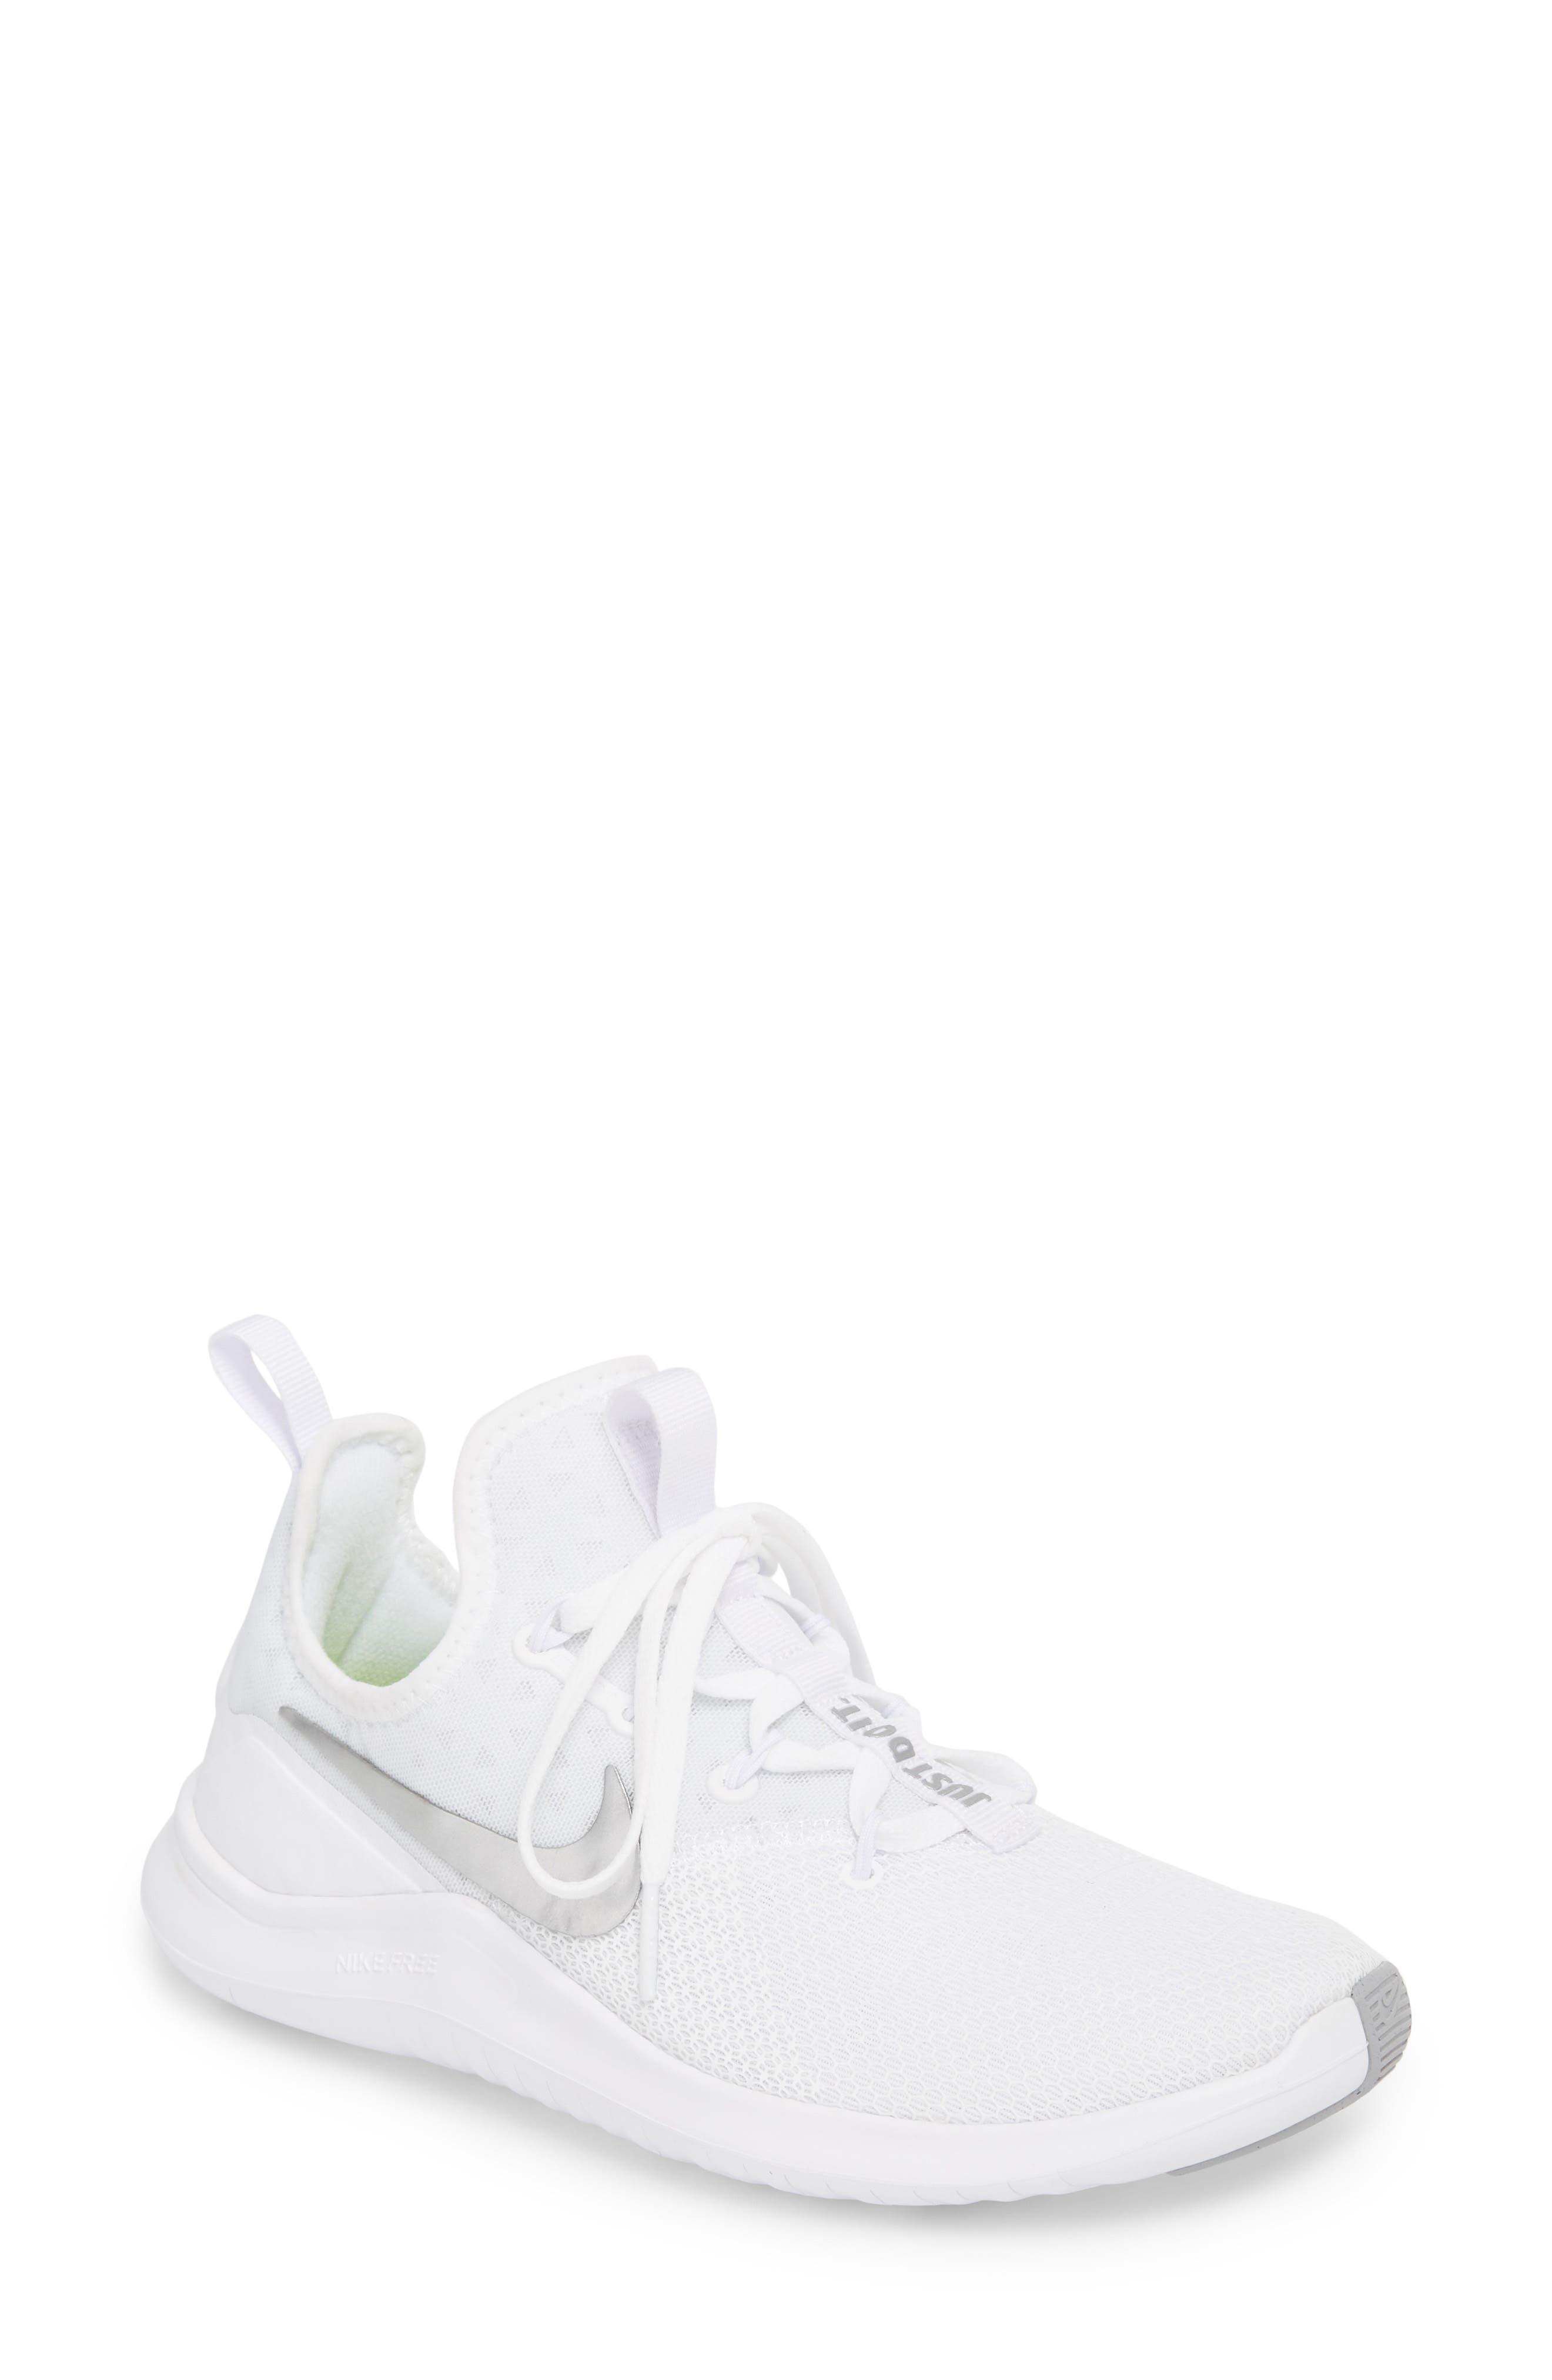 Free TR8 Training Shoe,                             Main thumbnail 1, color,                             White/ Metallic Silver/ White